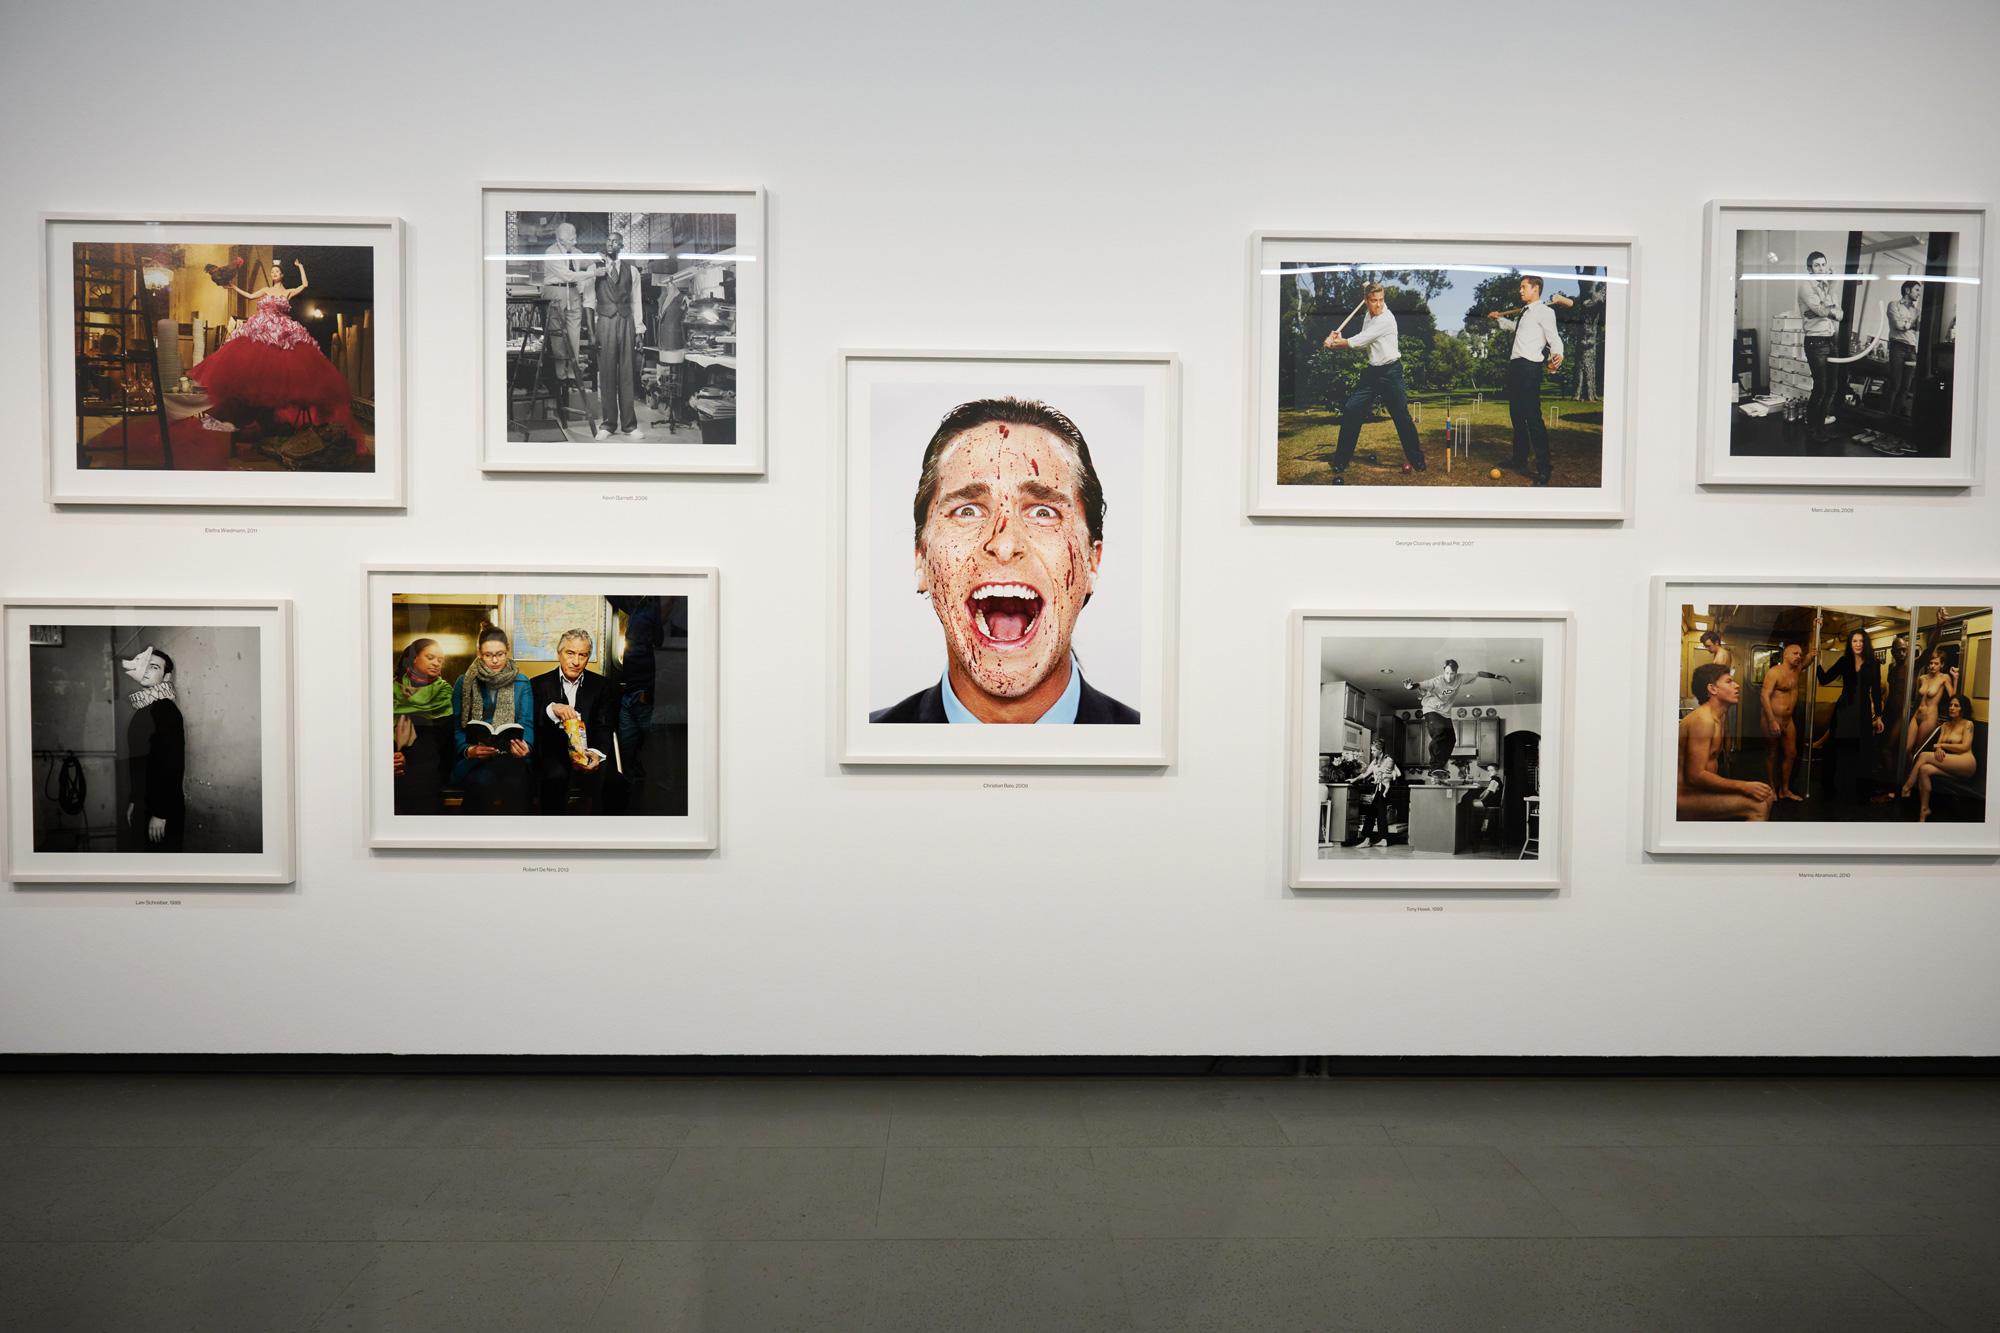 Martin Schoeller: Portraits